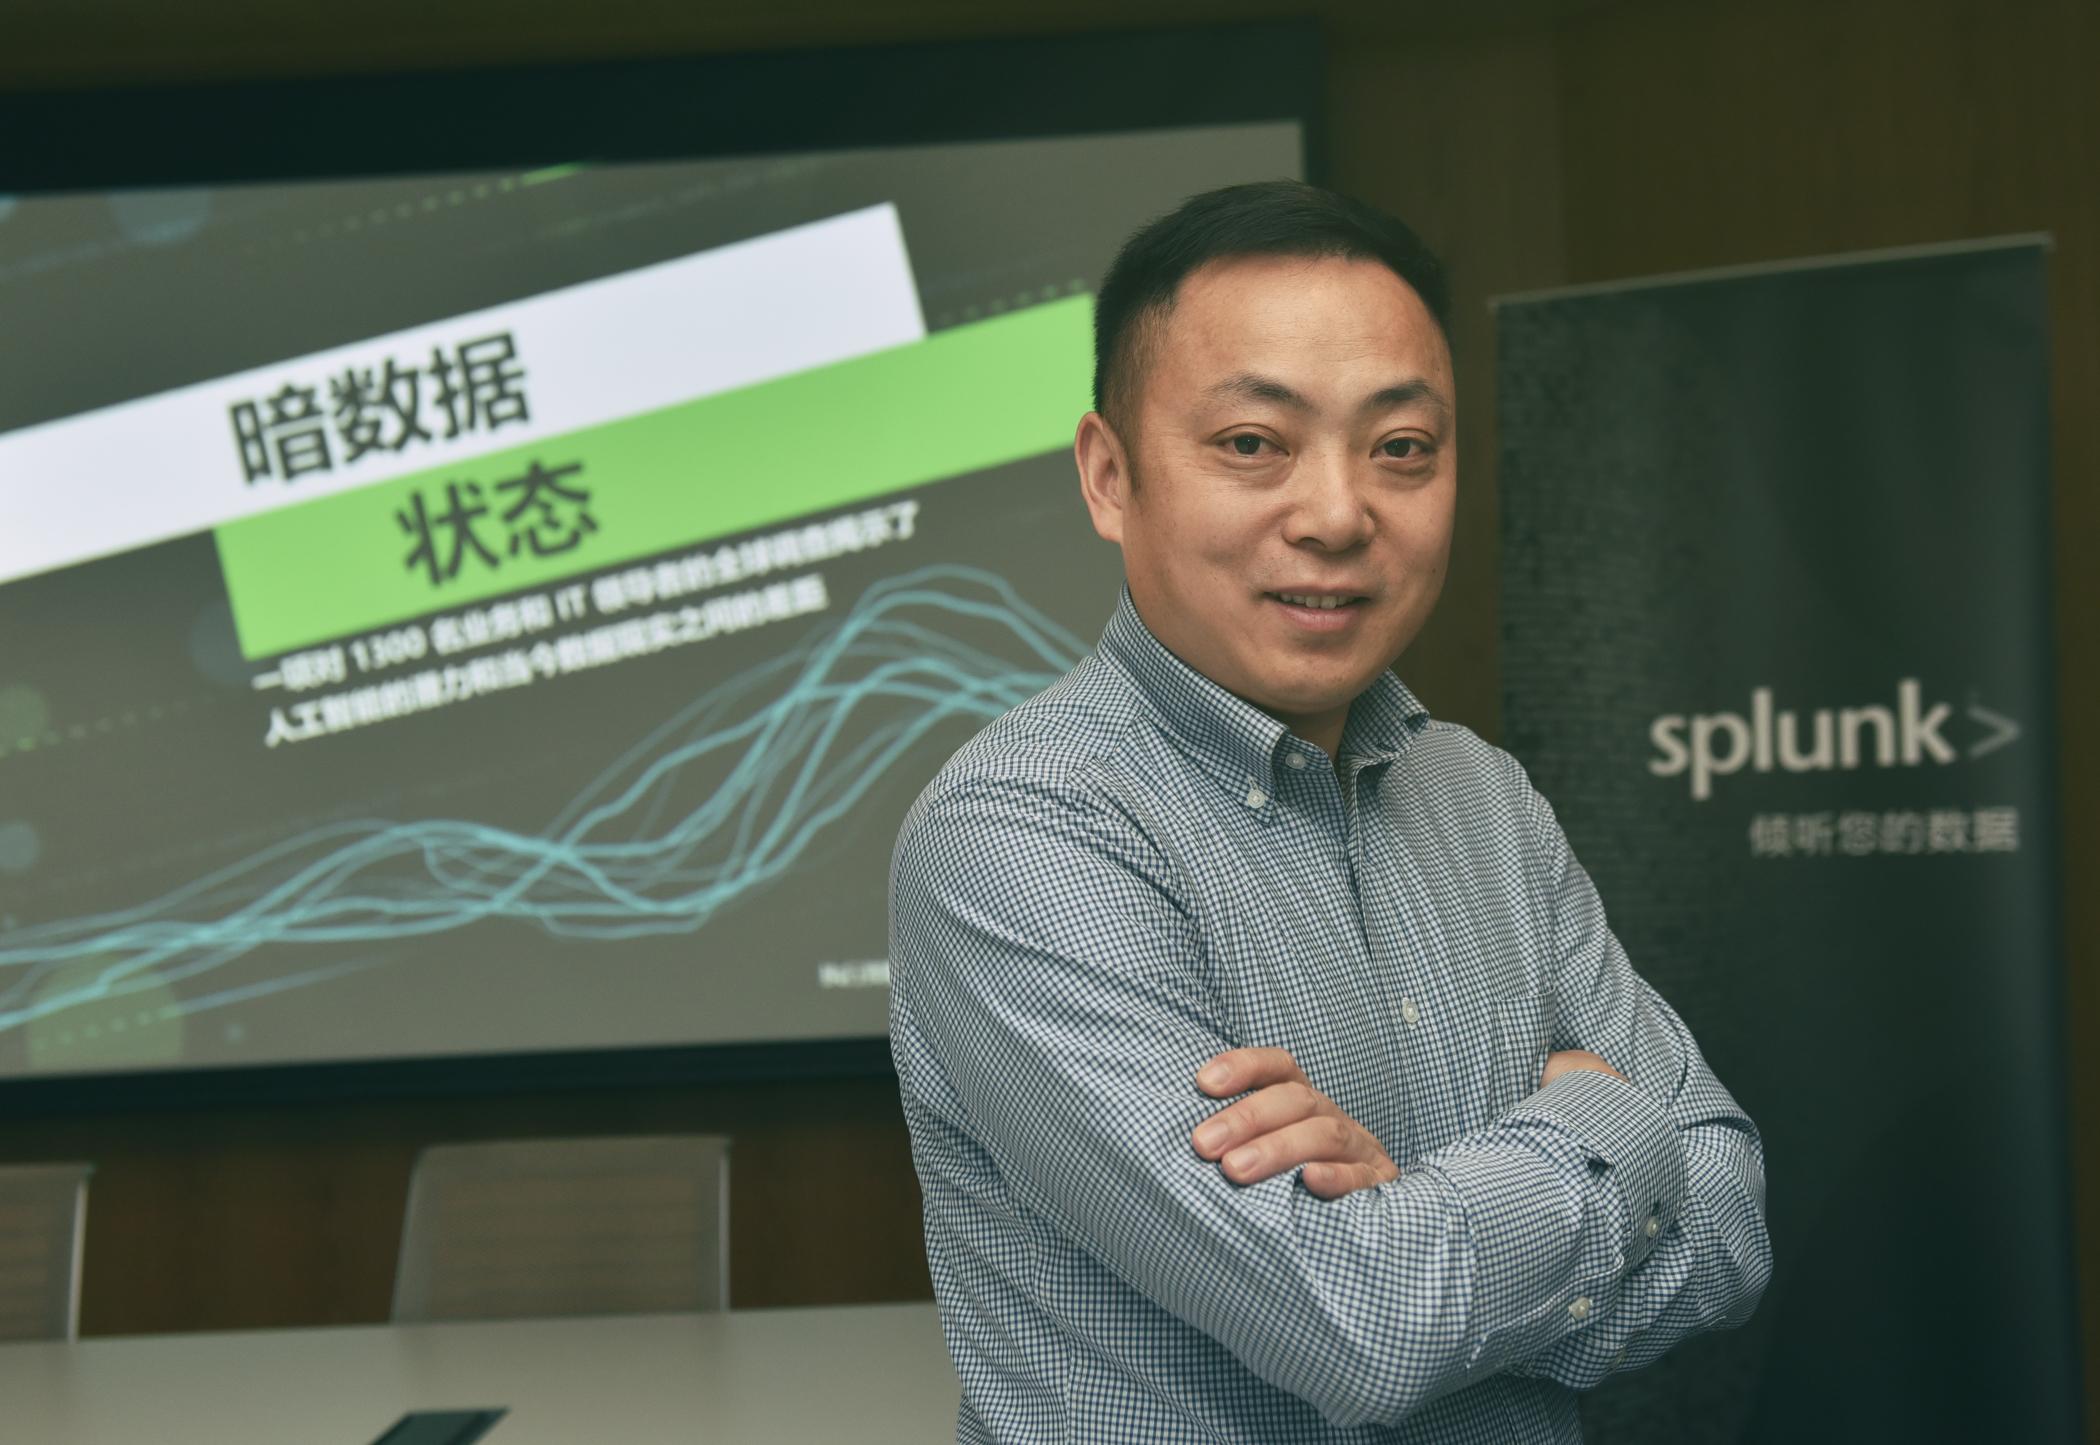 Splunk:重新认识数据的价值,积极拥抱AI应对变革时代